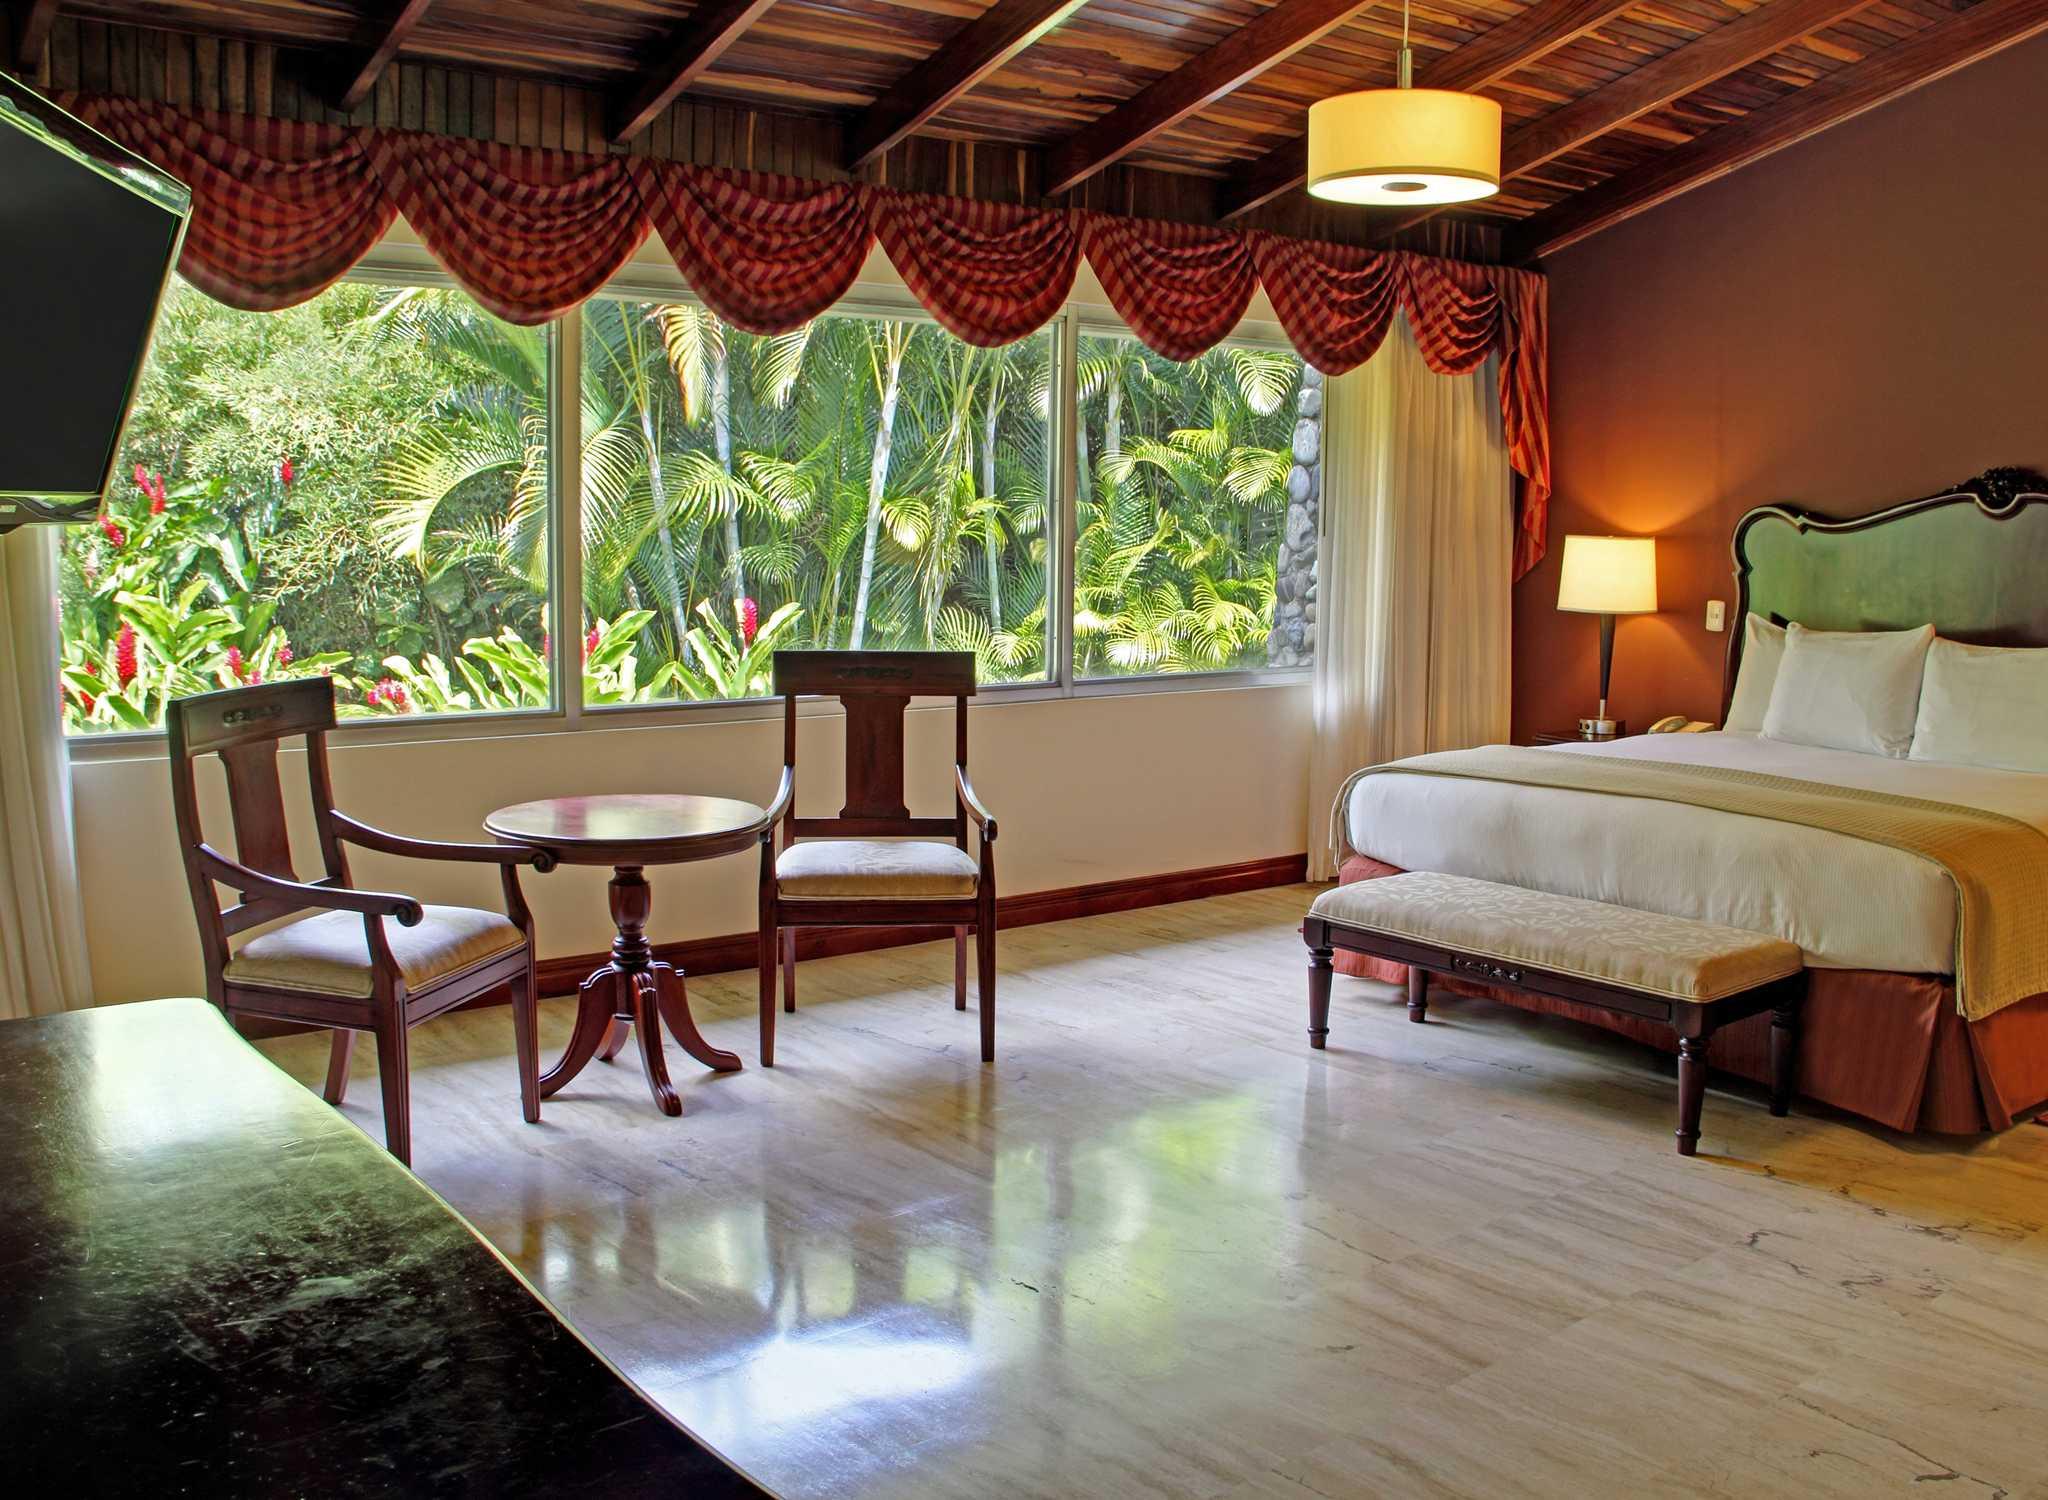 Hôtels à San José Costa Rica Hôtel Doubletree By Hilton Hotel